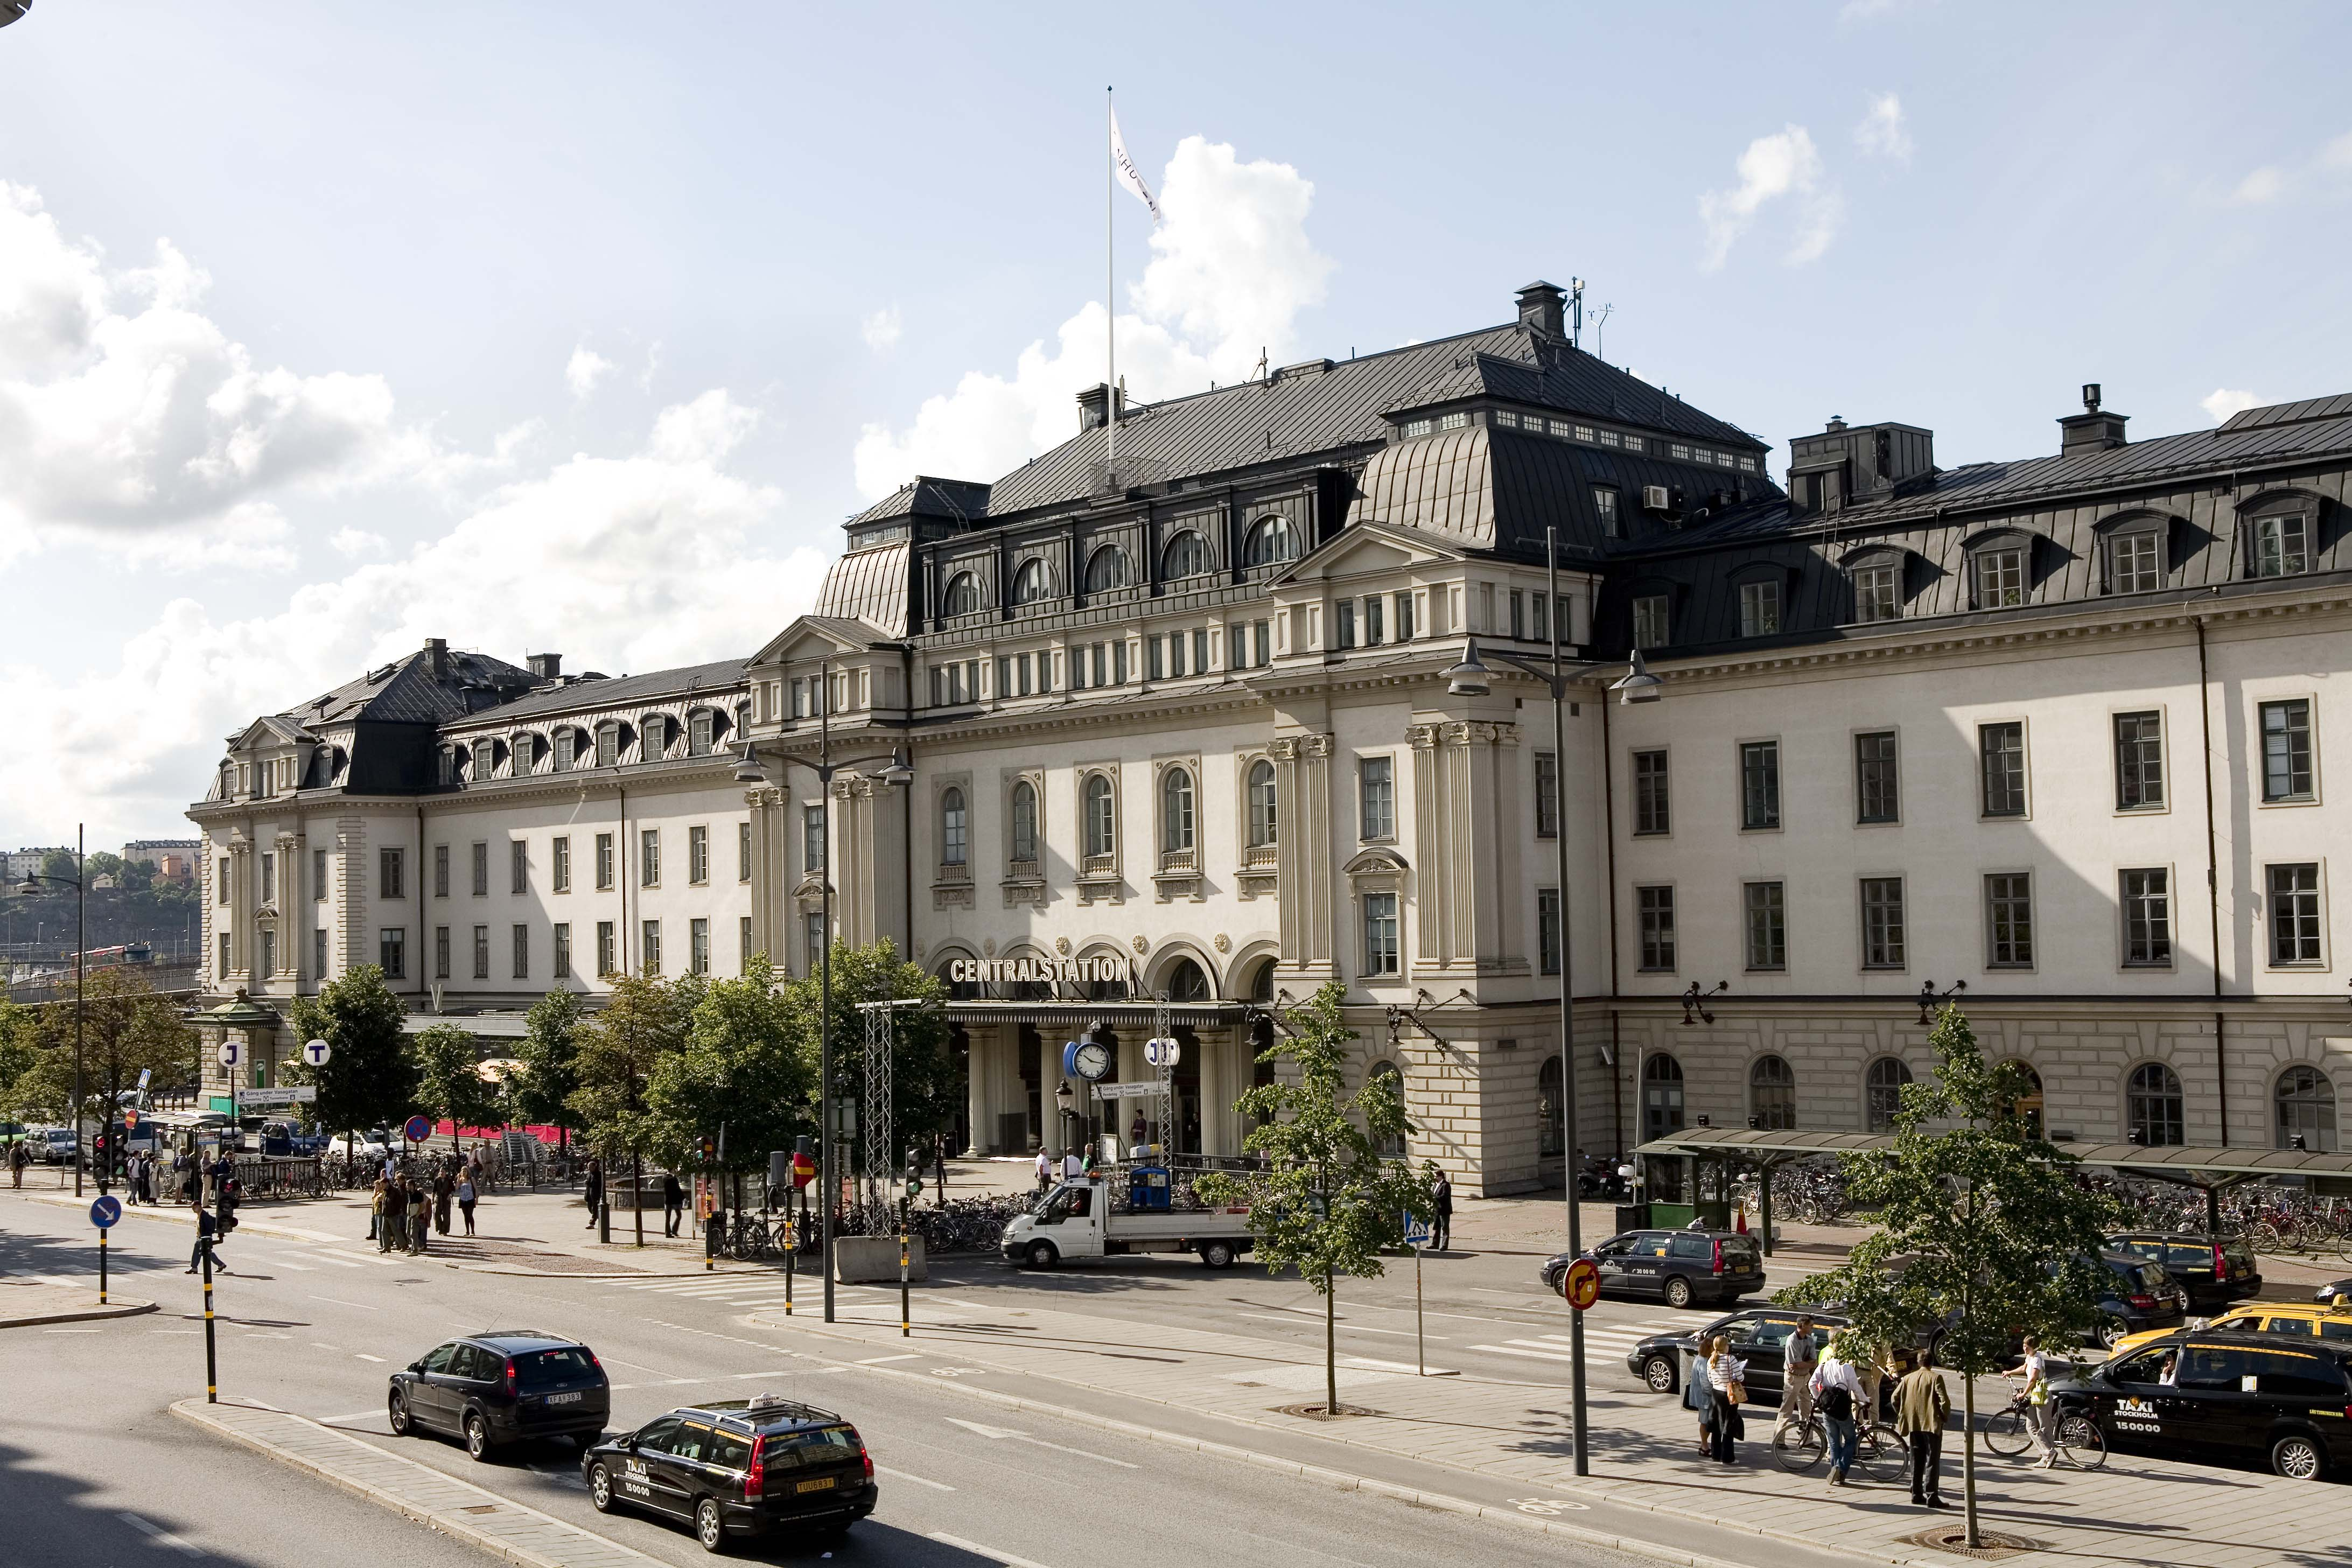 dejta i stockholm eskort uppsala